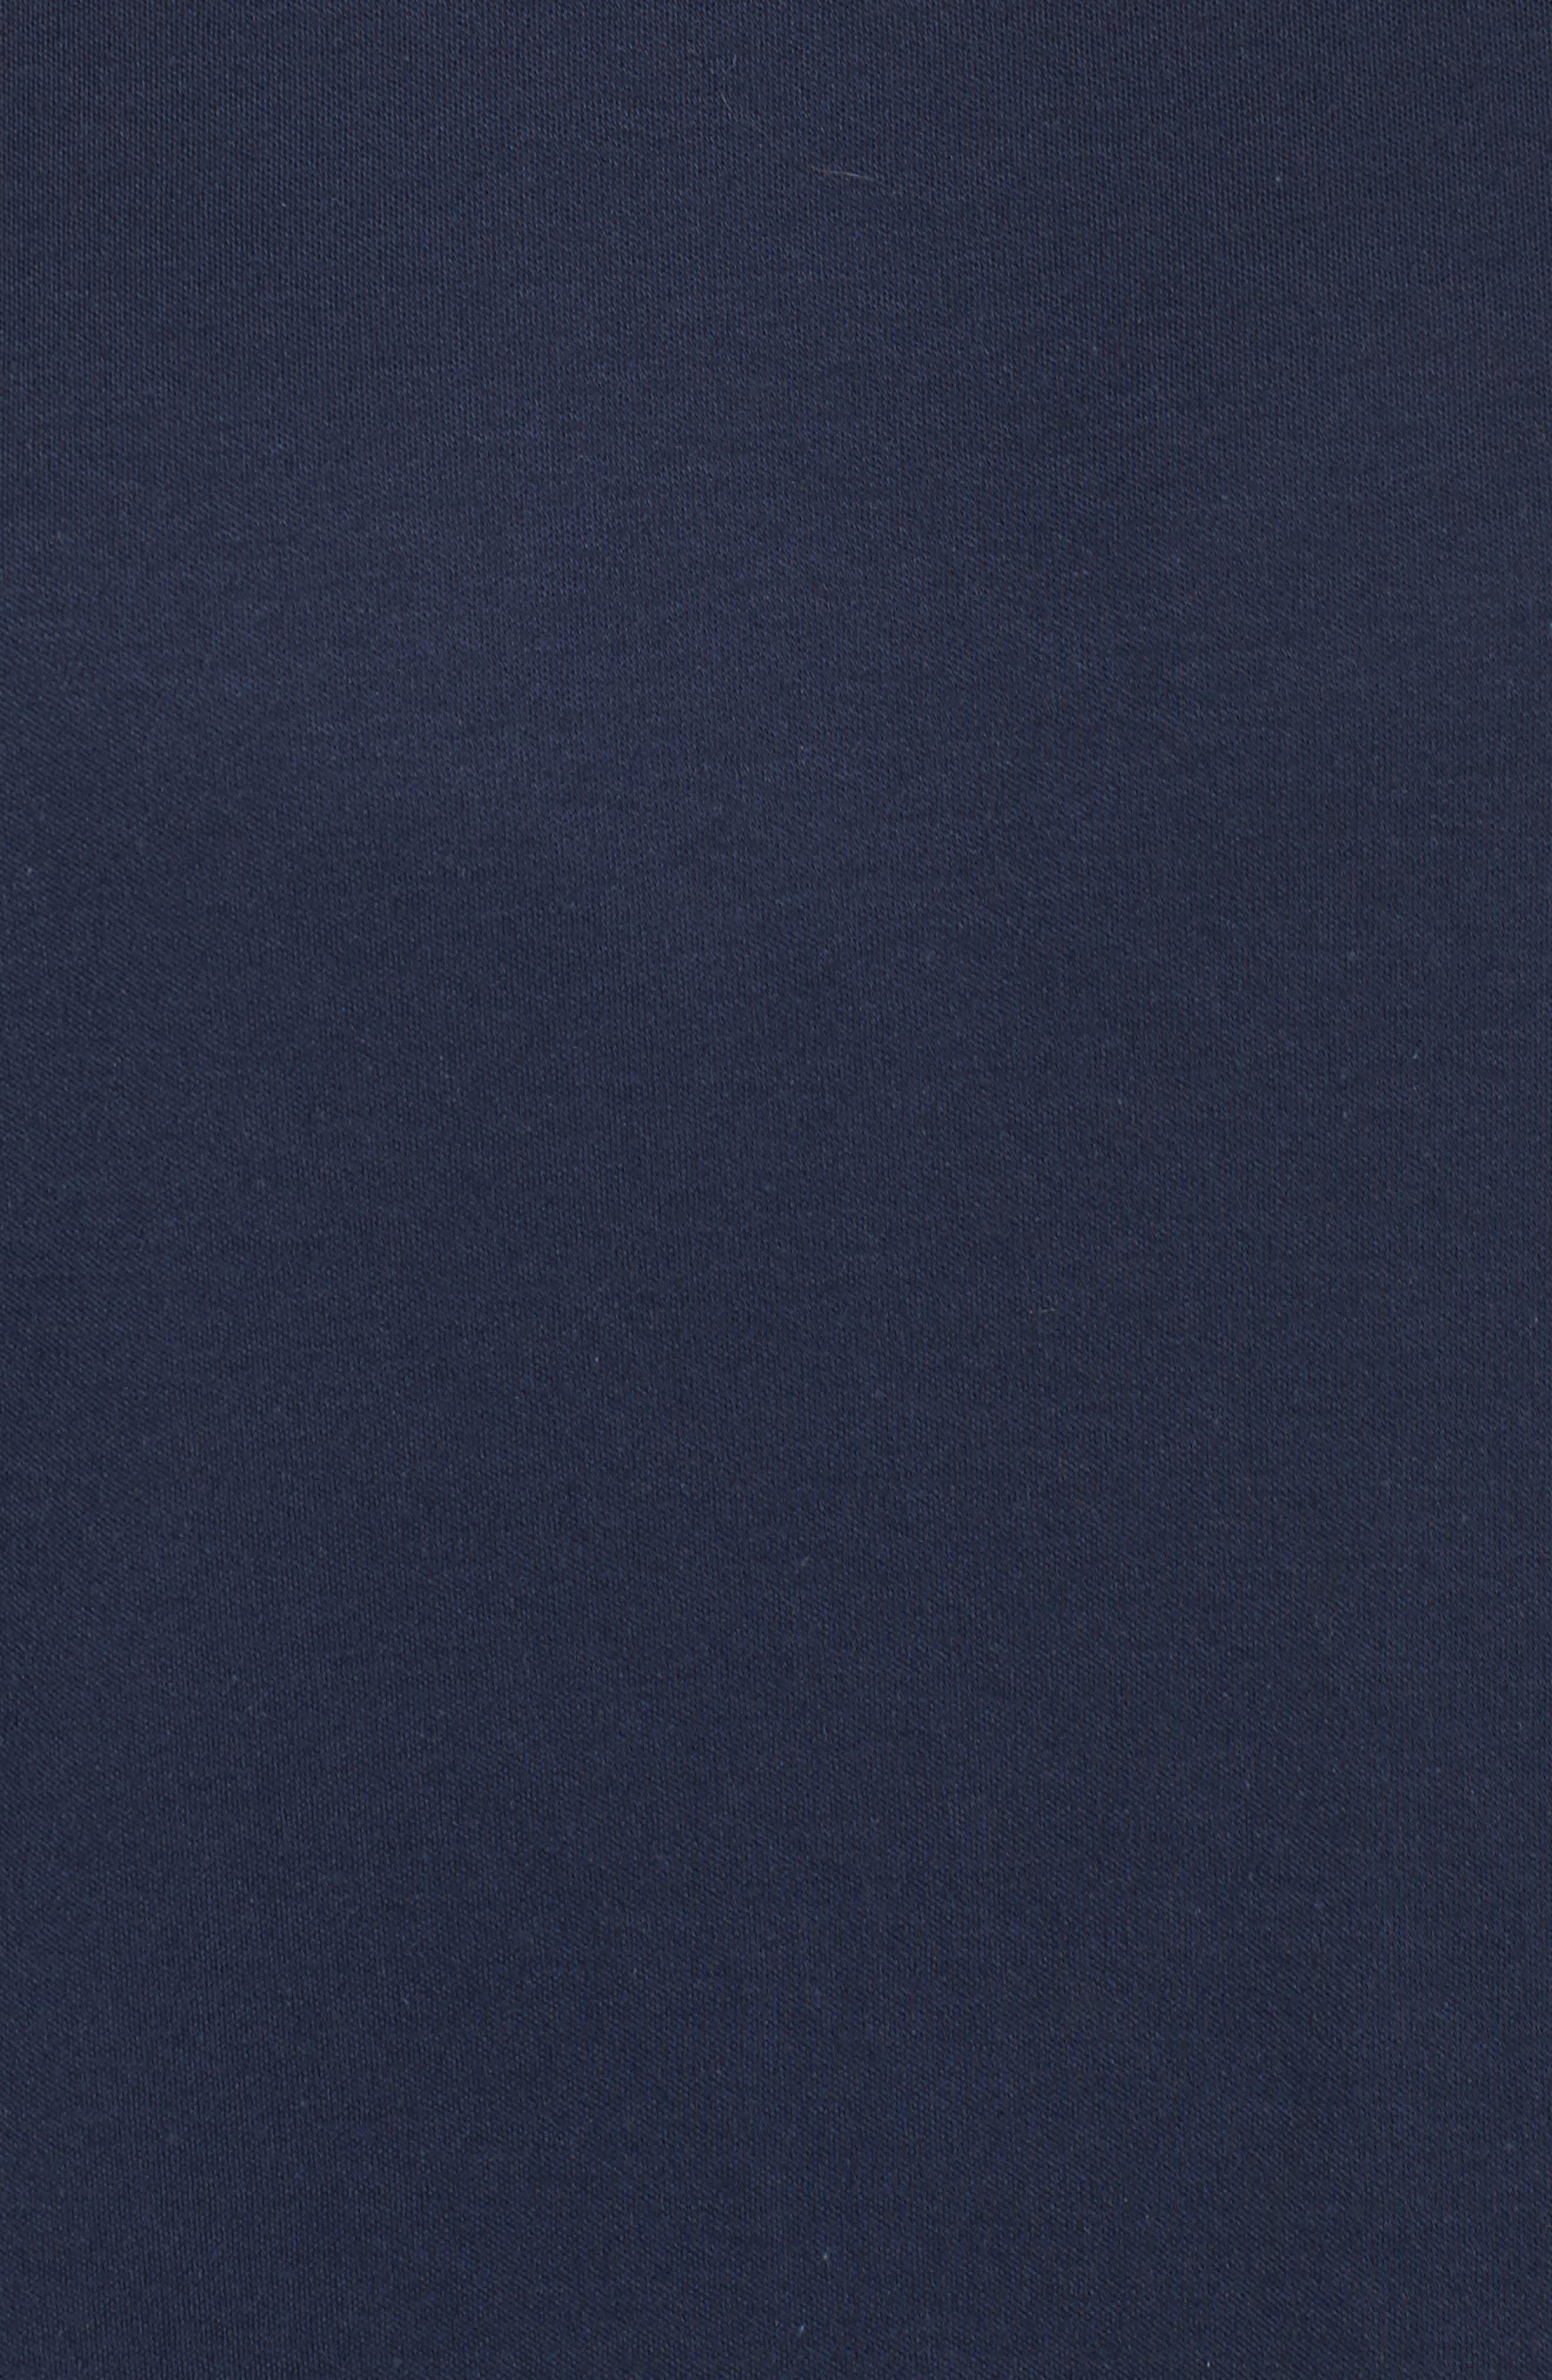 Enie Cotton Nightgown,                             Alternate thumbnail 5, color,                             433